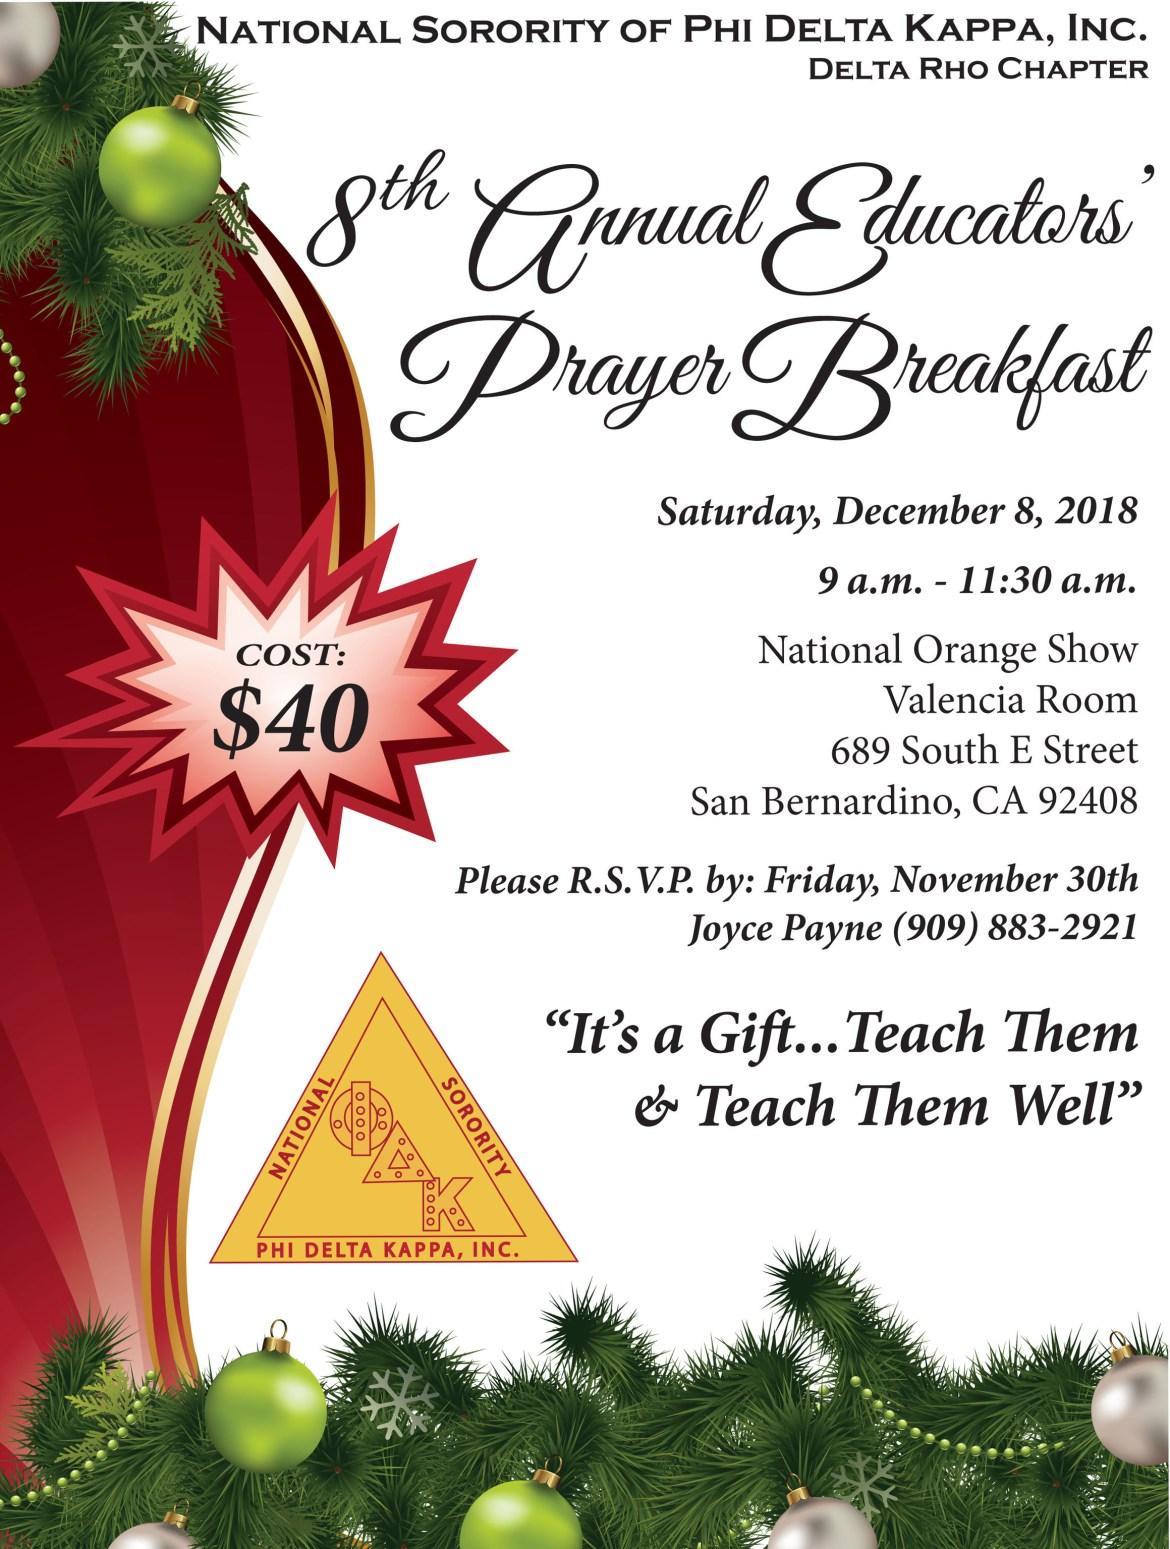 Annual Educators' Prayer Breakfast - 2018